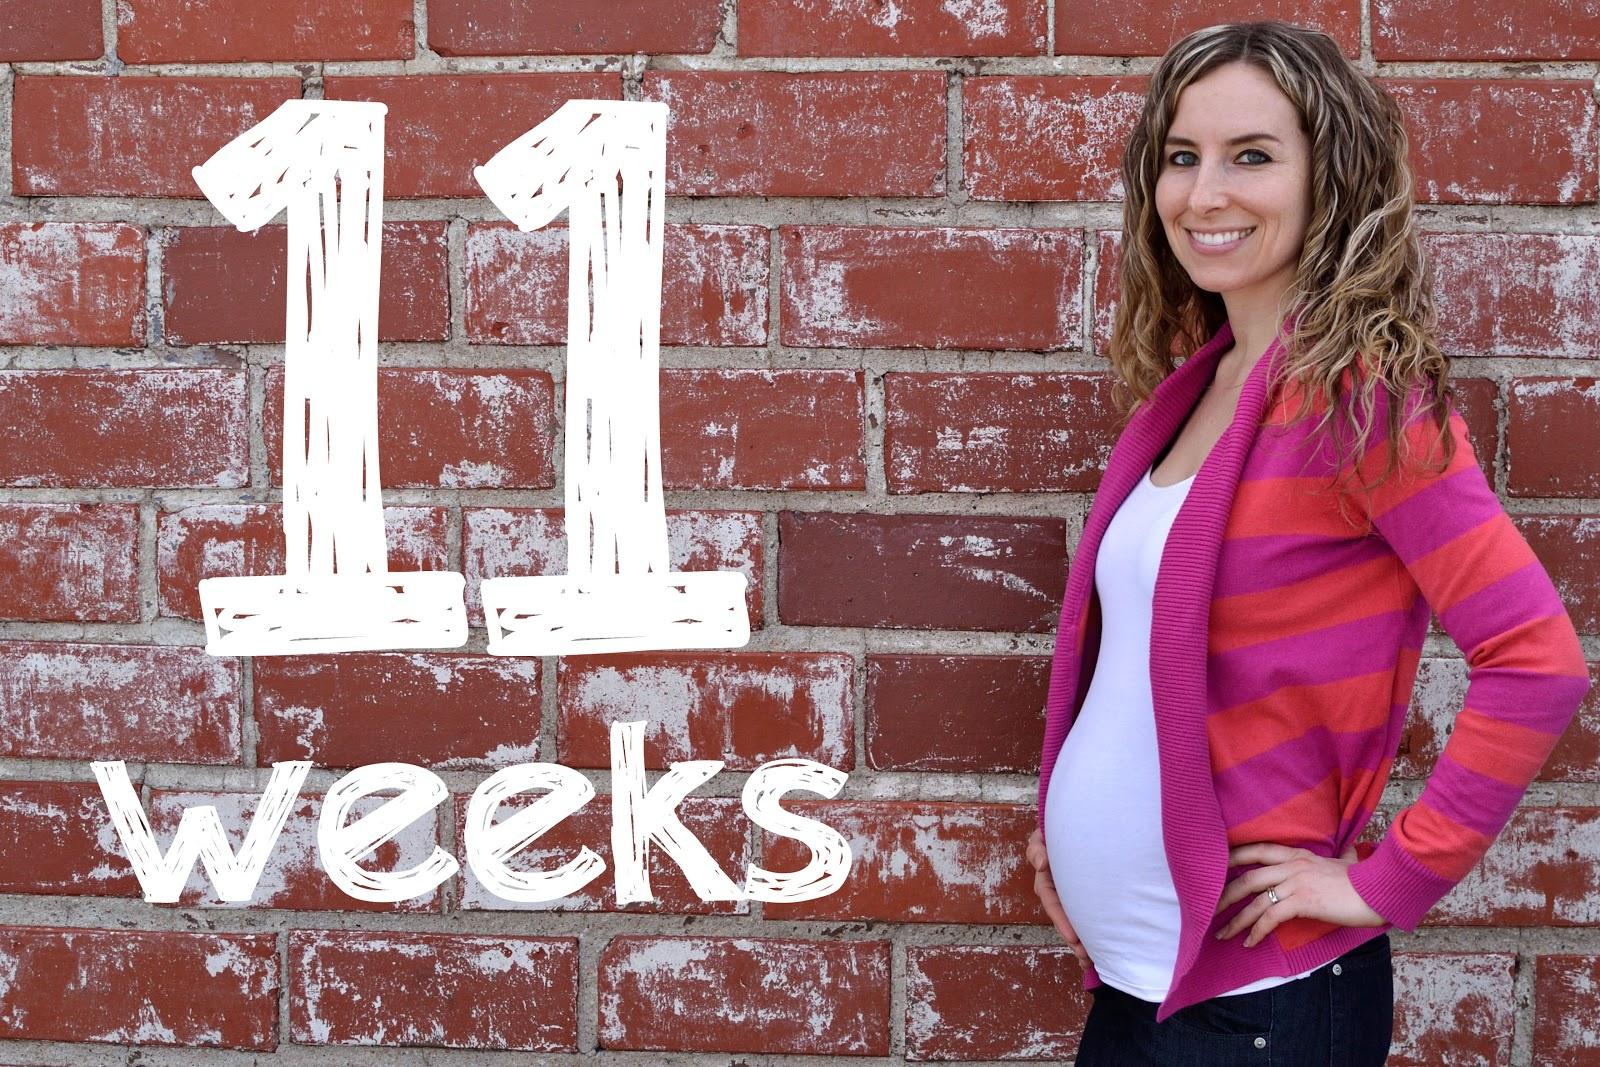 Ashley's Green Life: 11 Weeks